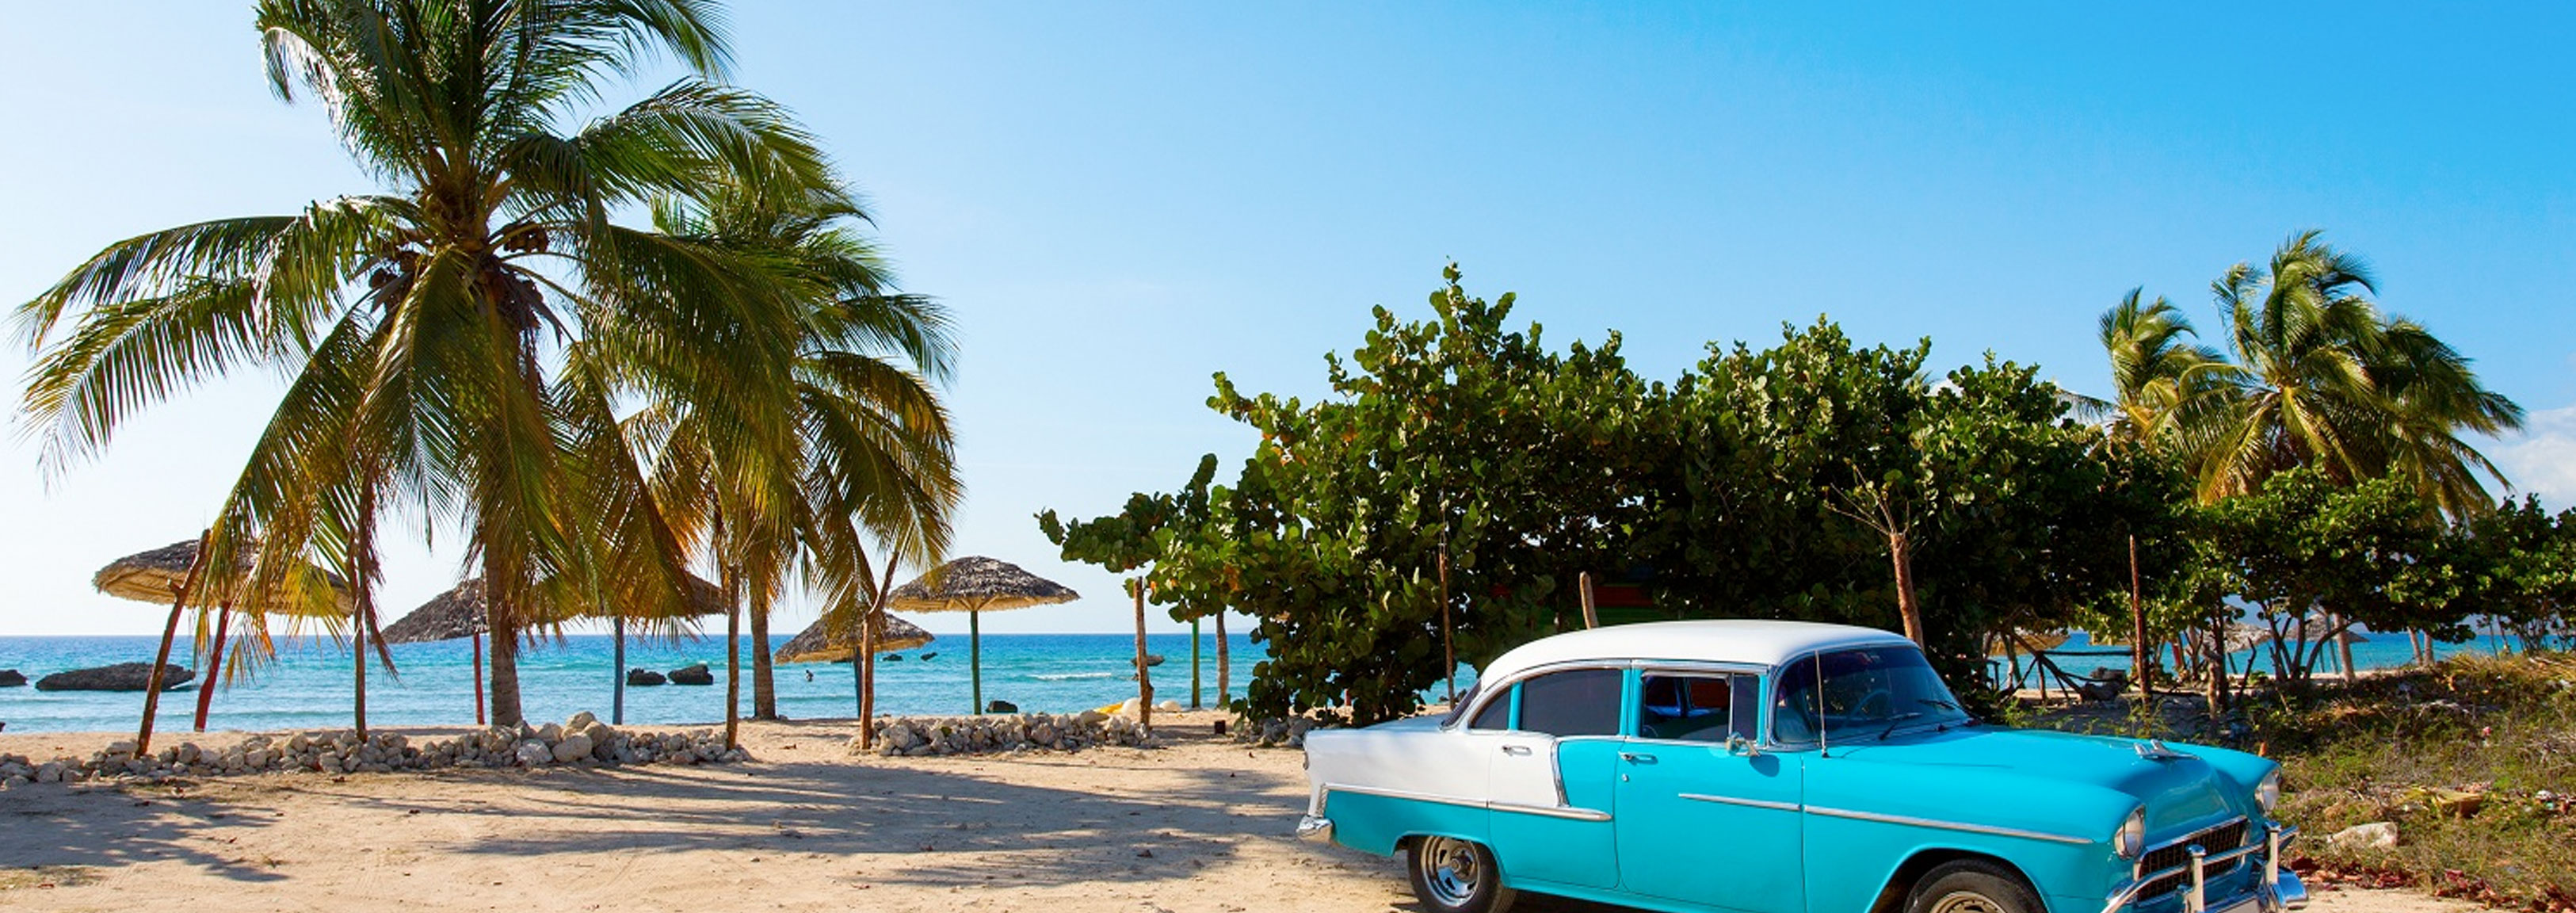 La Habana & Varadero Cuba